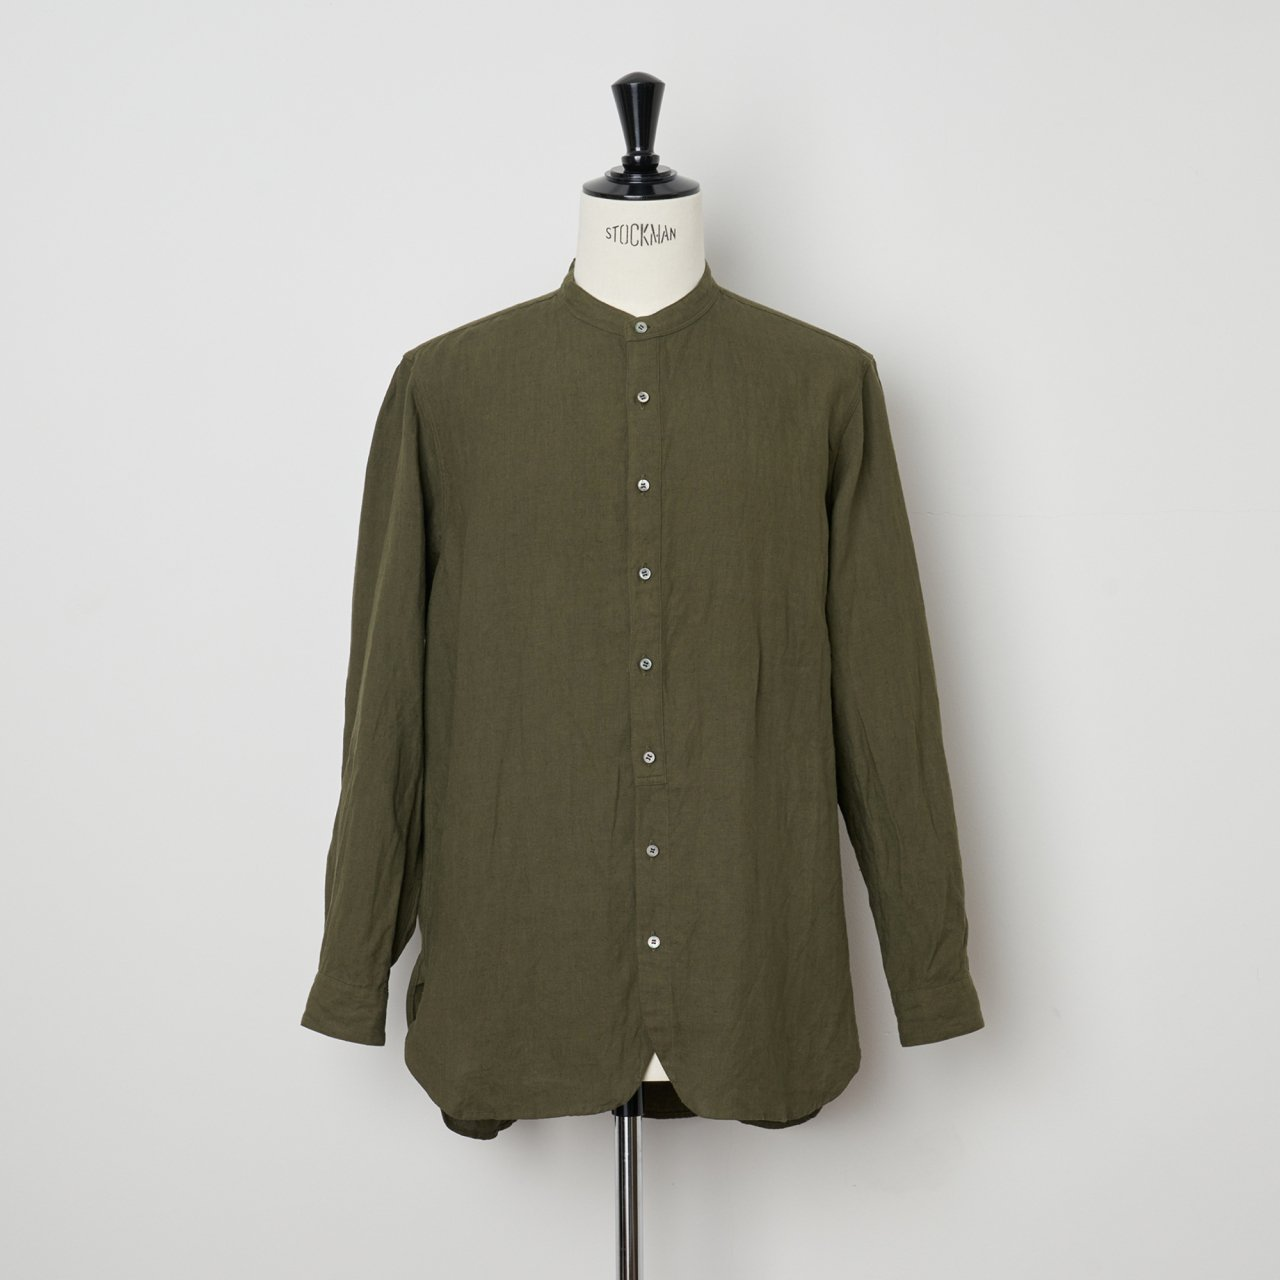 suzuki takayuki<BR>peasant shirt<BR>khaki